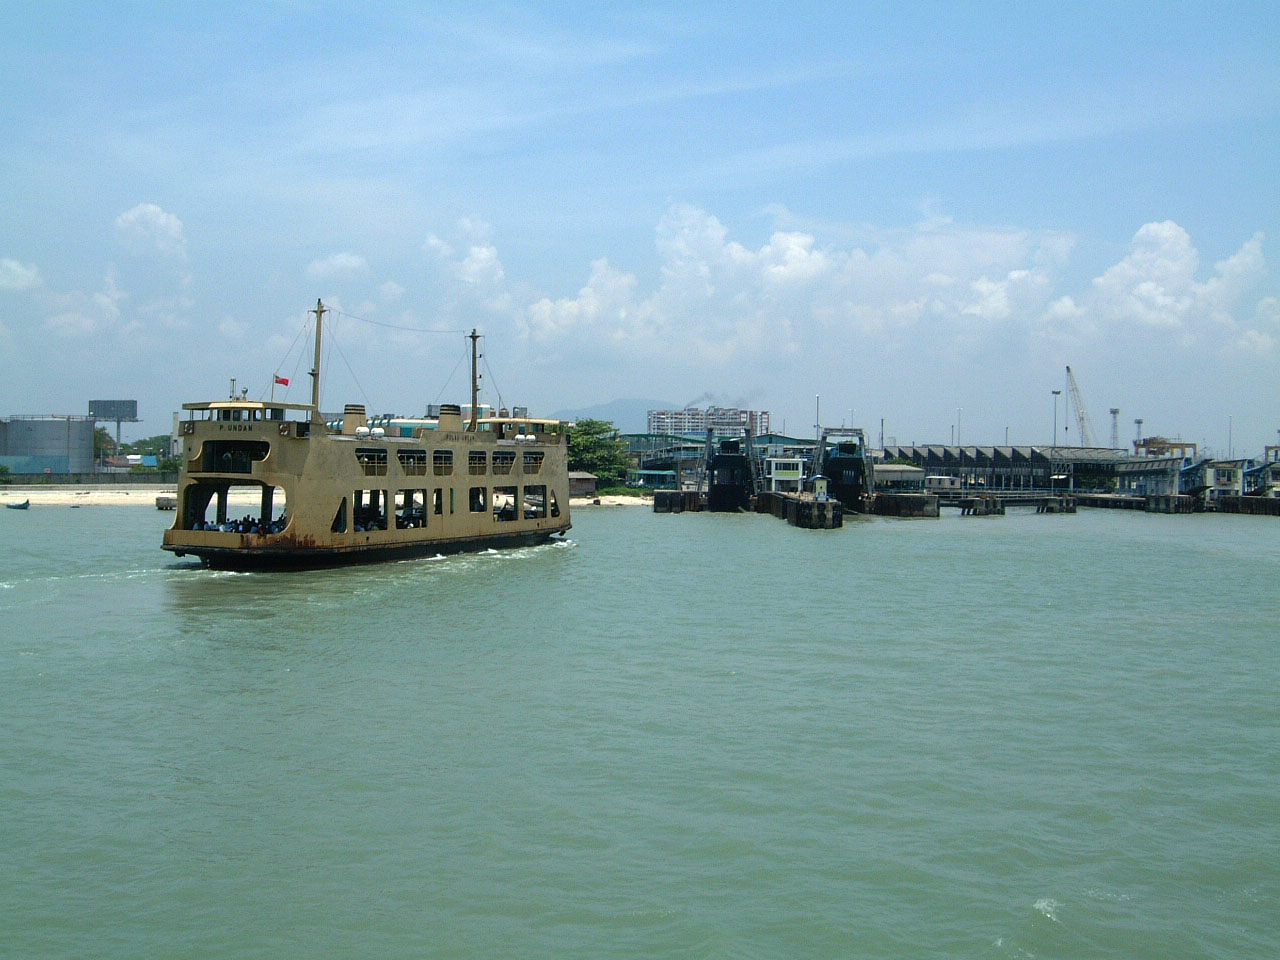 Penang Ferry Pulau Undan docking Butterworth jetty Mar 2001 02